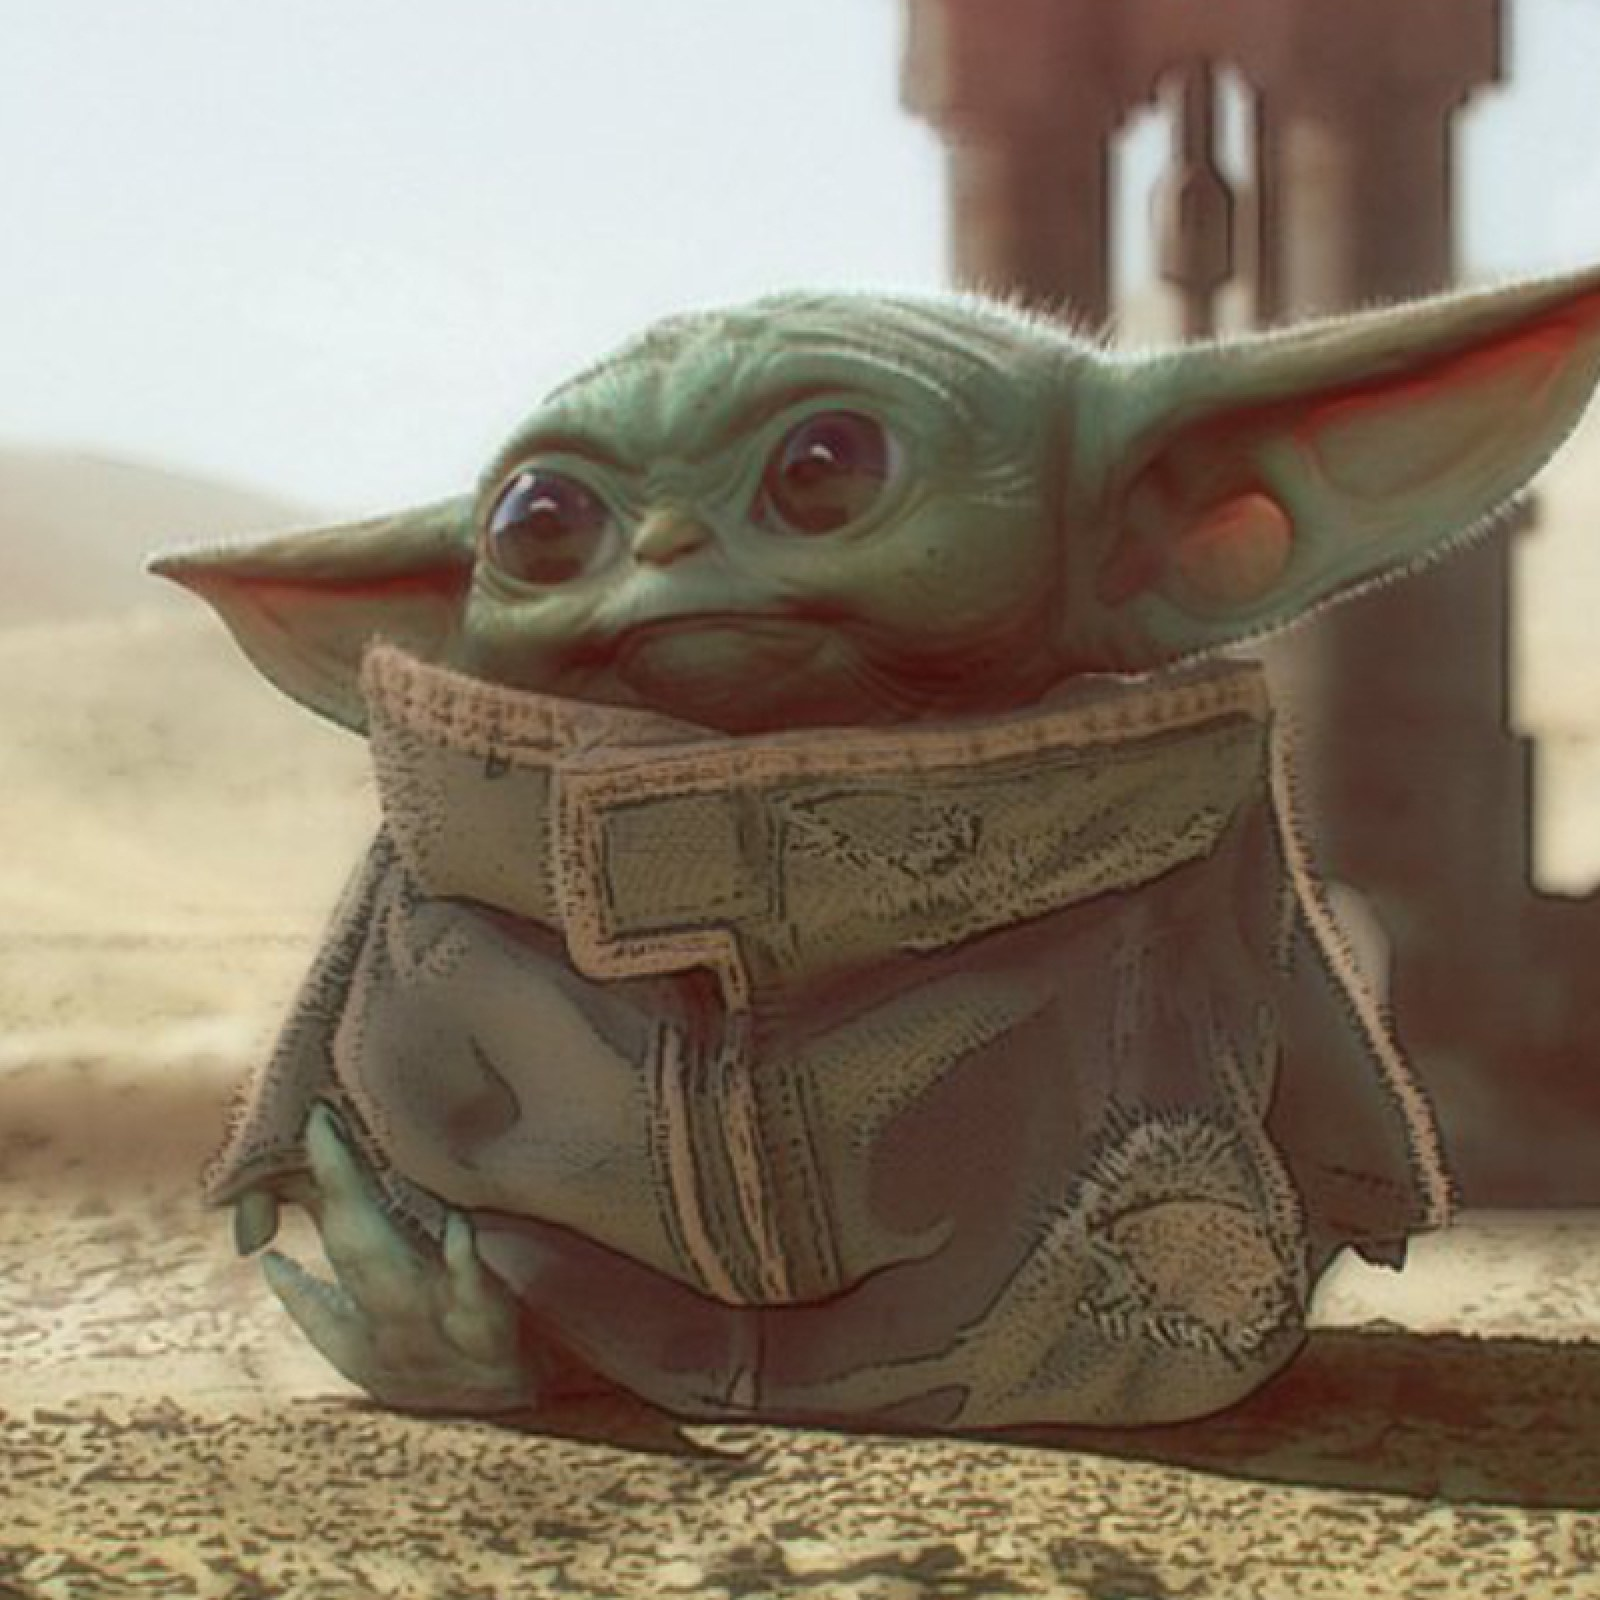 The Mandalorian How To Buy Baby Yoda Merch For Christmas